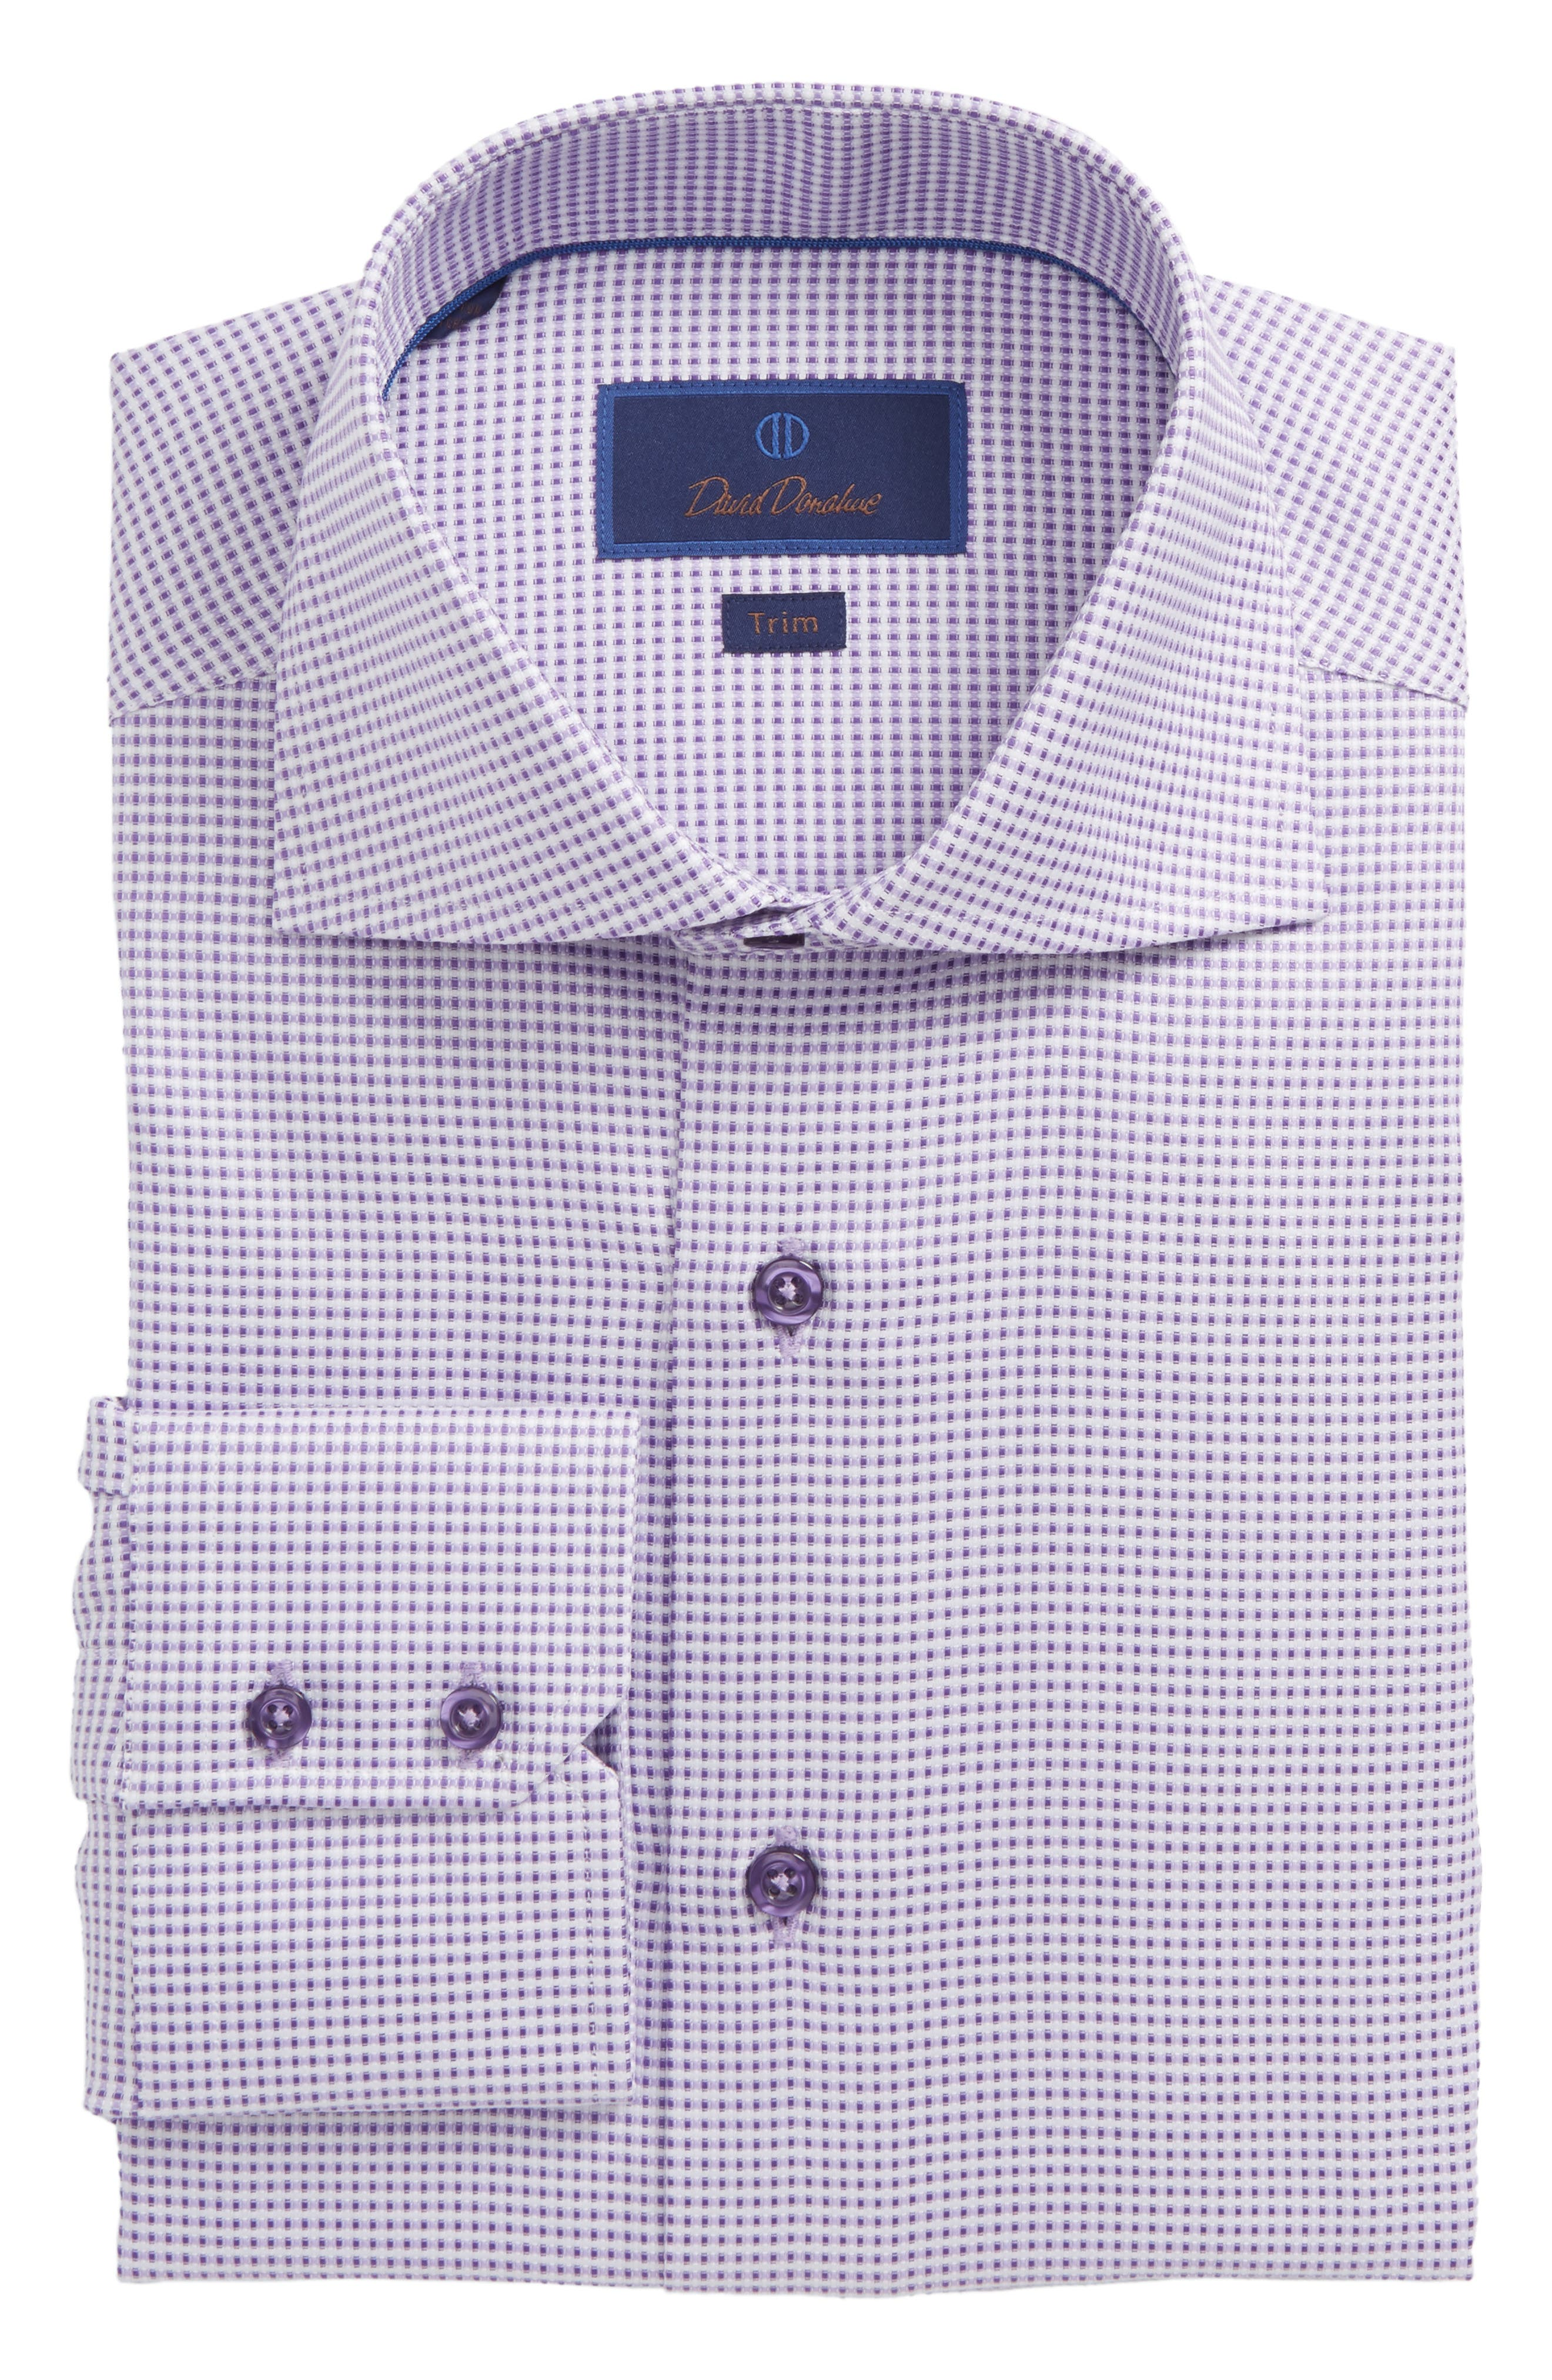 Trim Fit Dobby Dress Shirt,                             Main thumbnail 1, color,                             Lilac